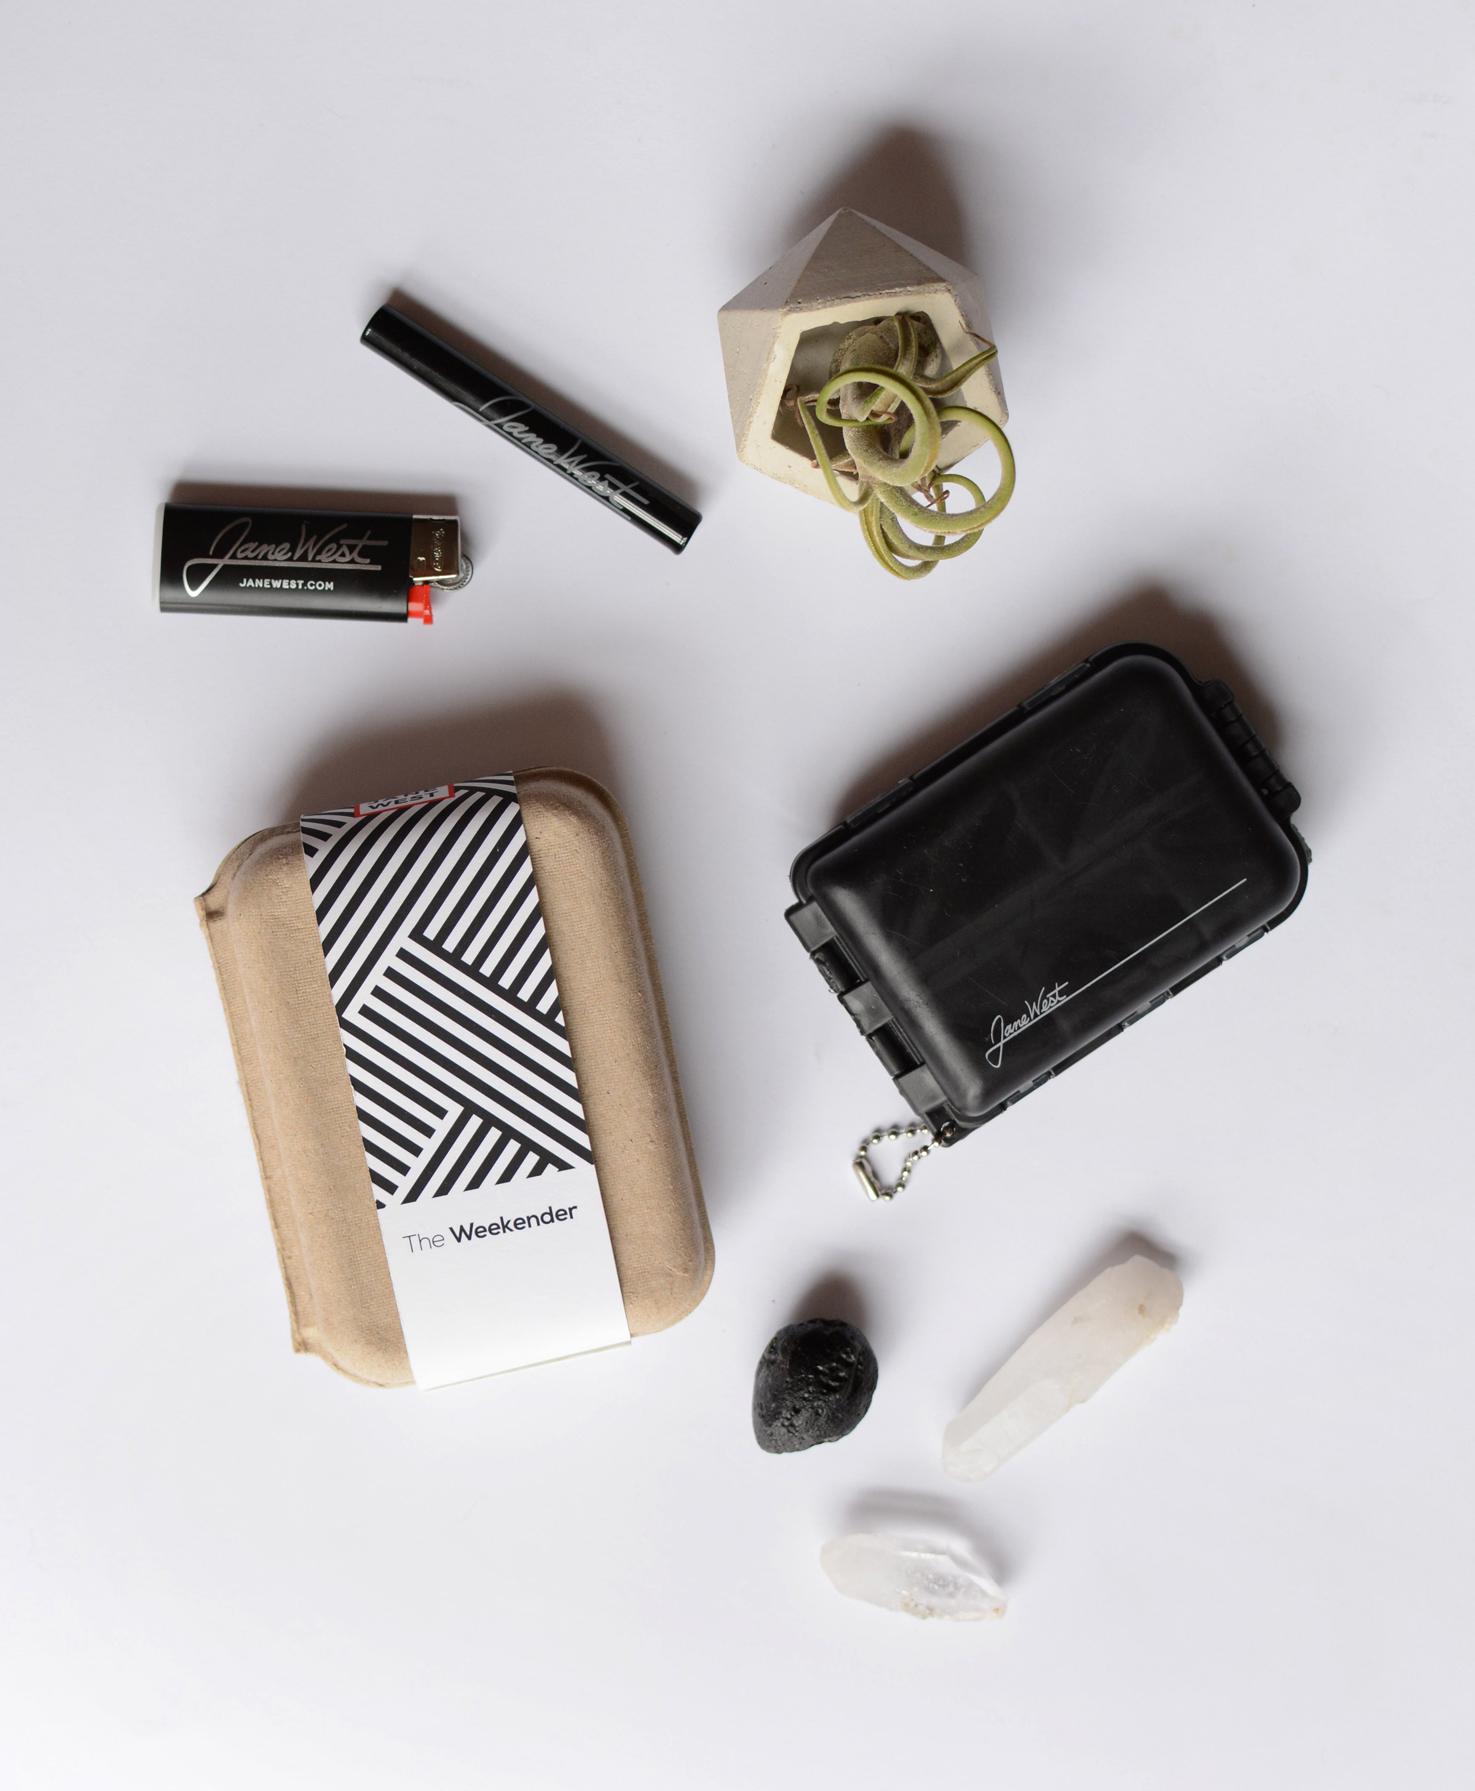 Jane West,  Packaging Design 2016